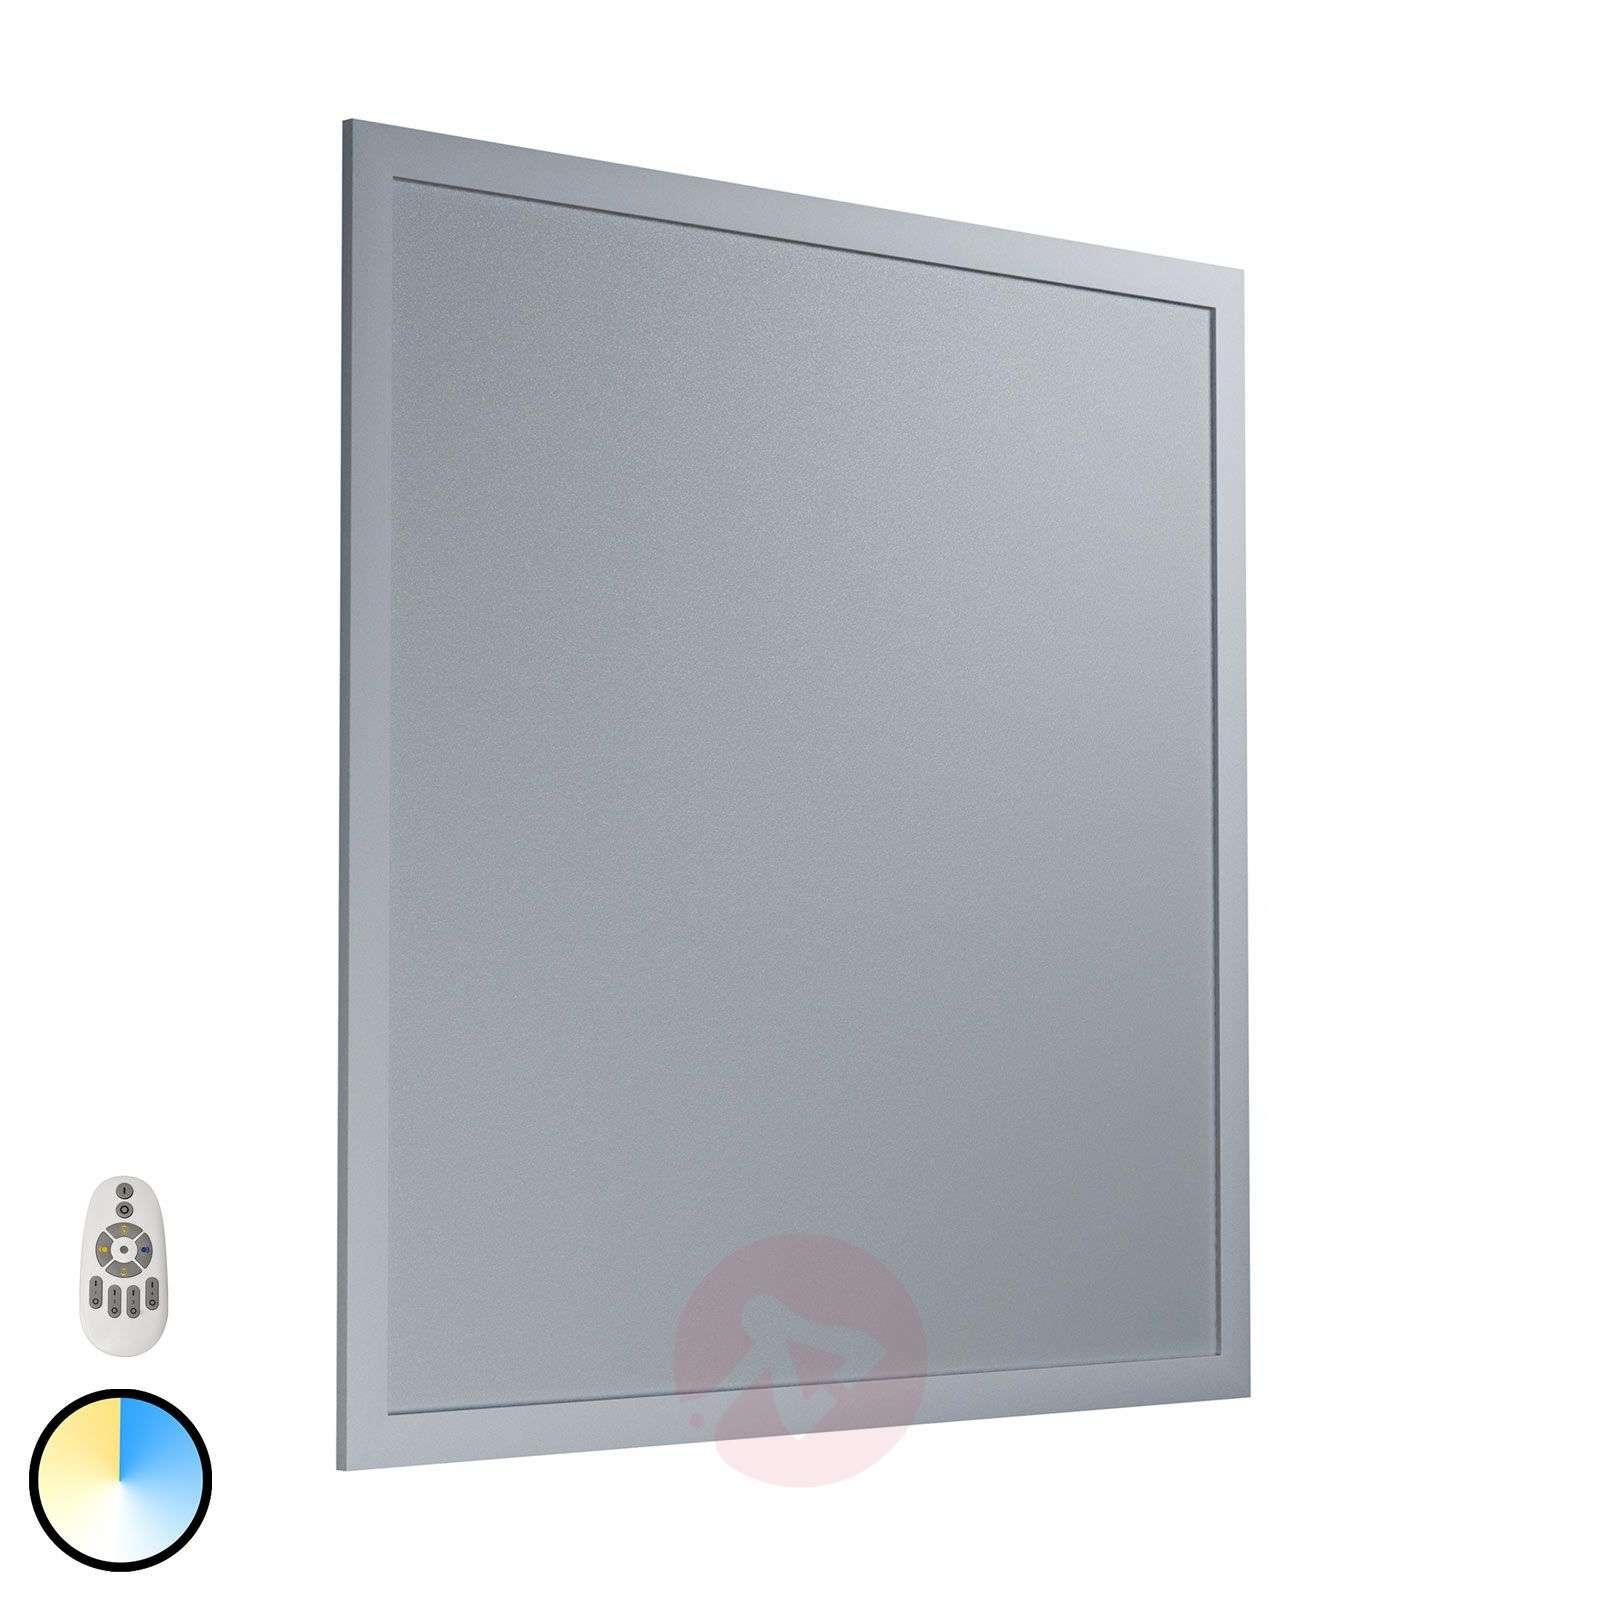 LEDVANCE Planon Plus LED panel 60cm 840 30W CCT-6106024-01